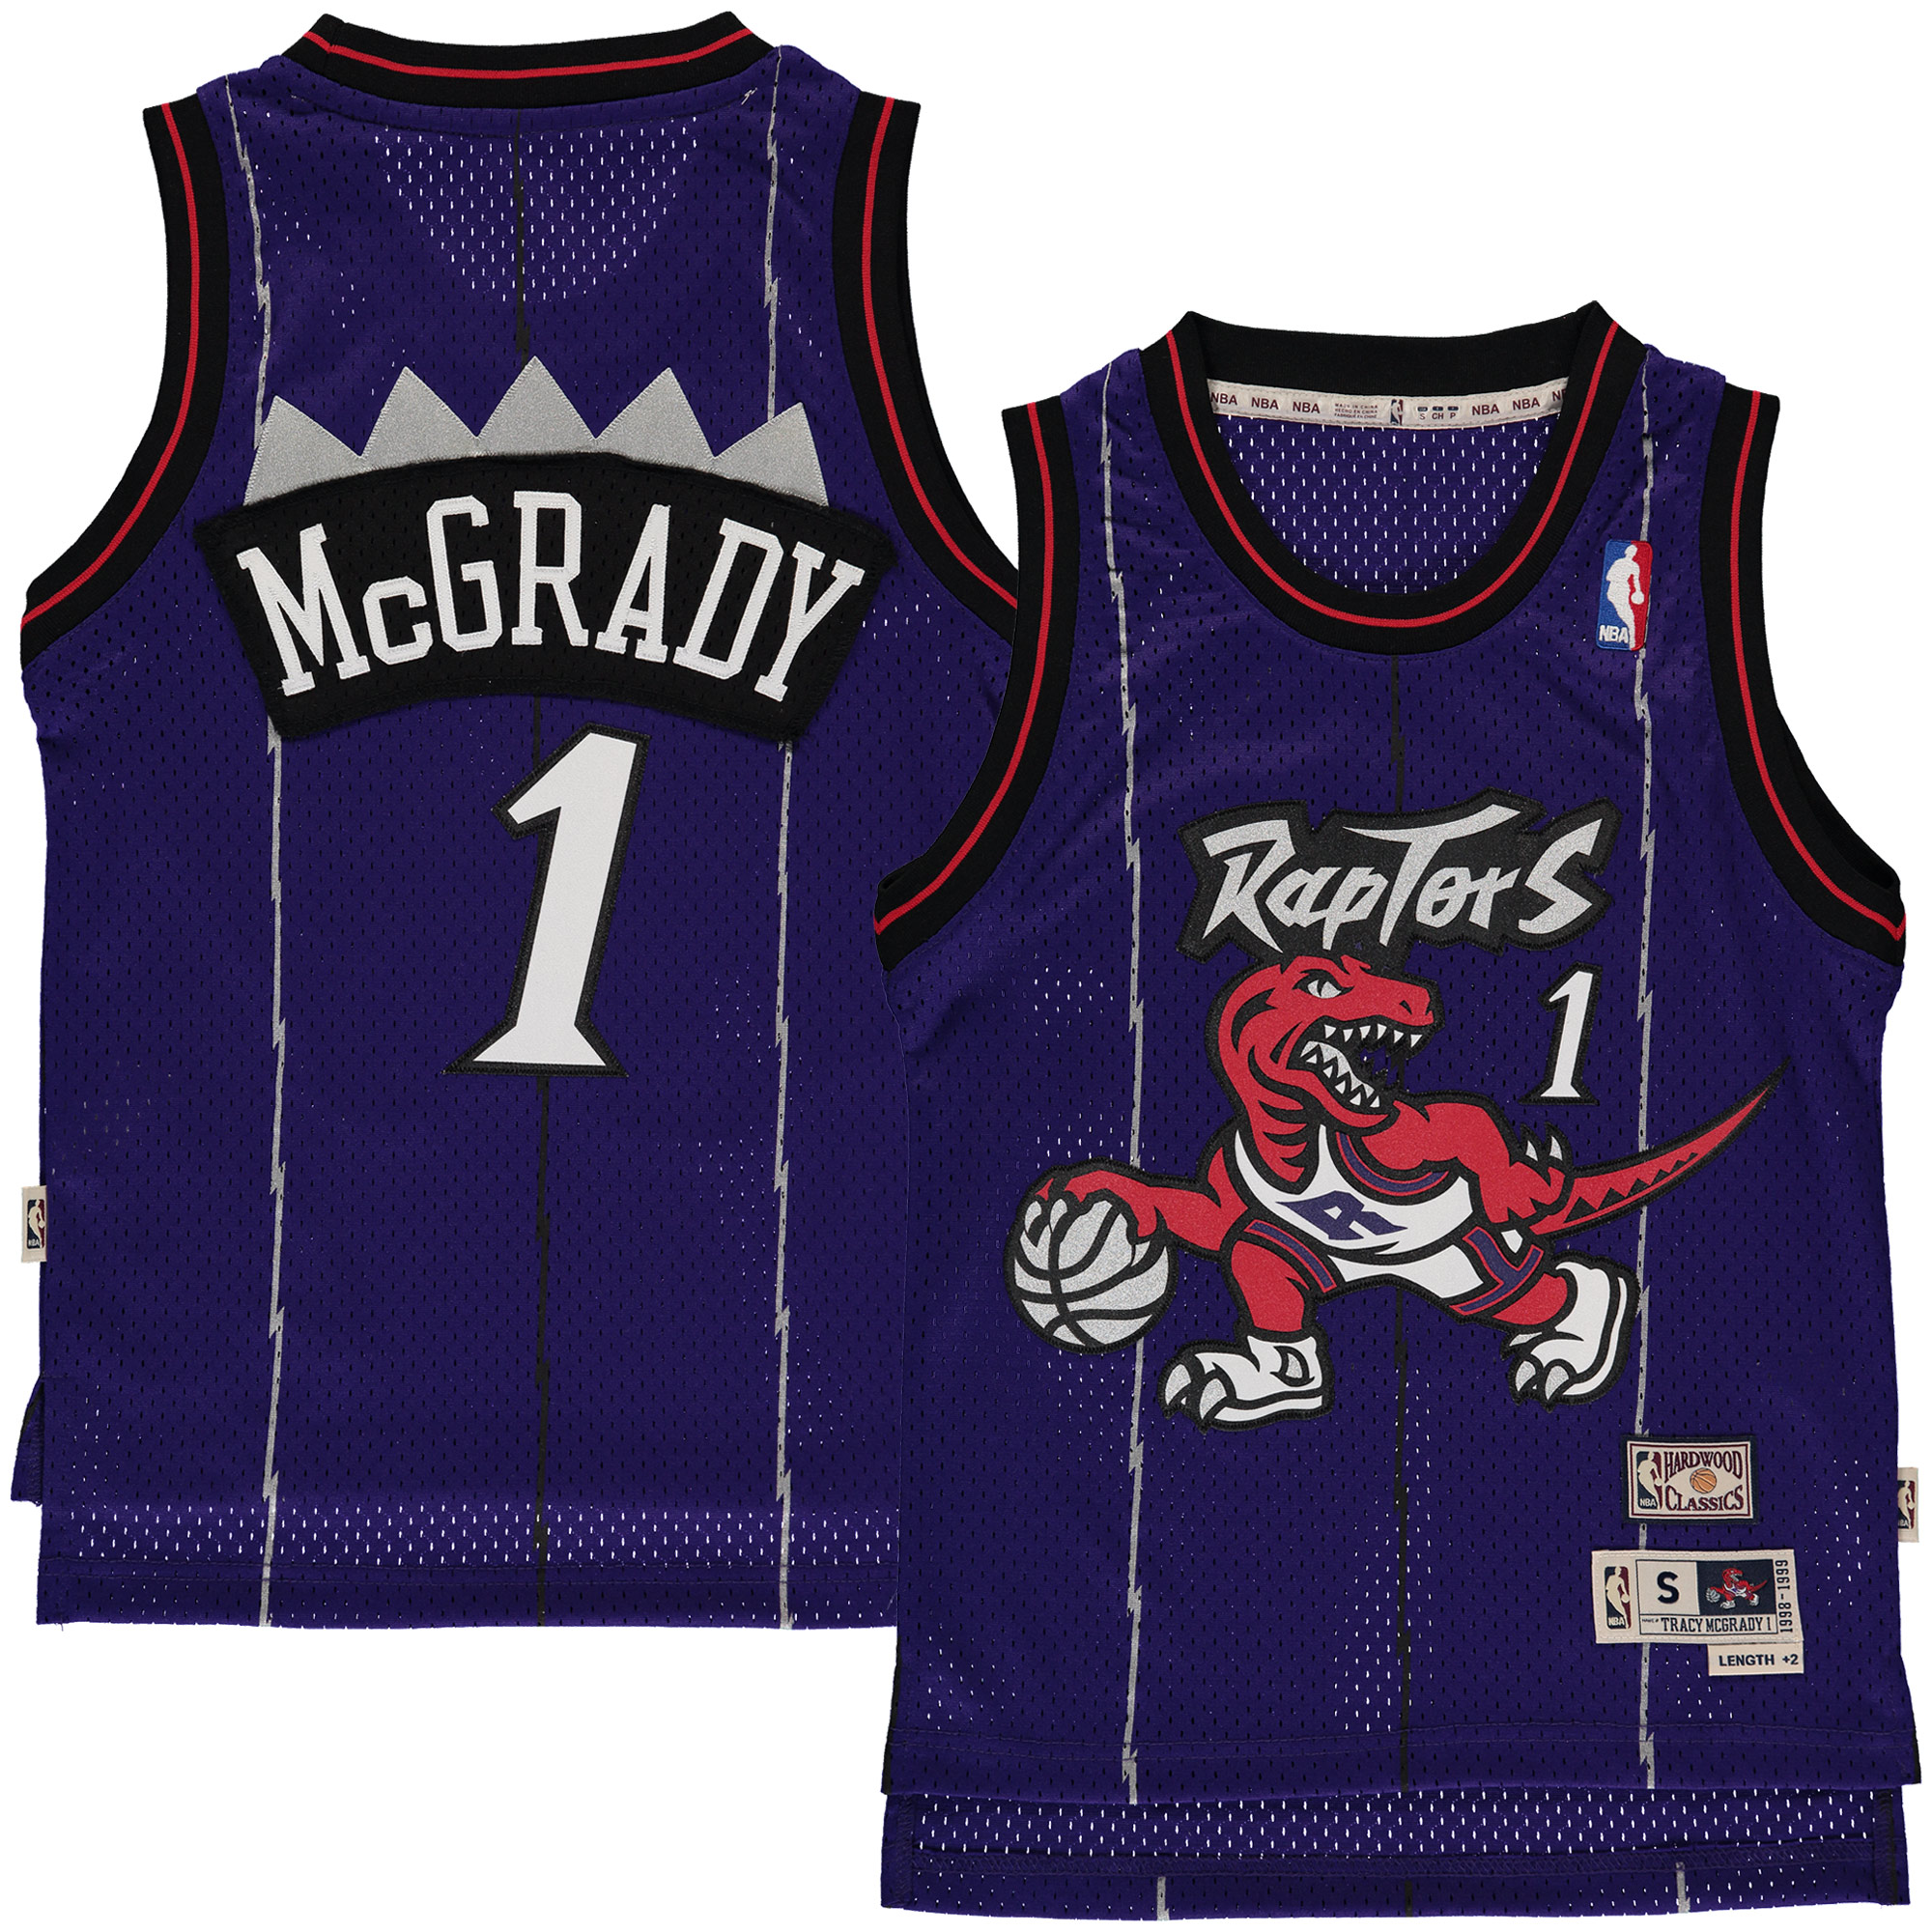 e28e753da2f Tracy McGrady Toronto Raptors Mitchell   Ness Youth Hardwood ...